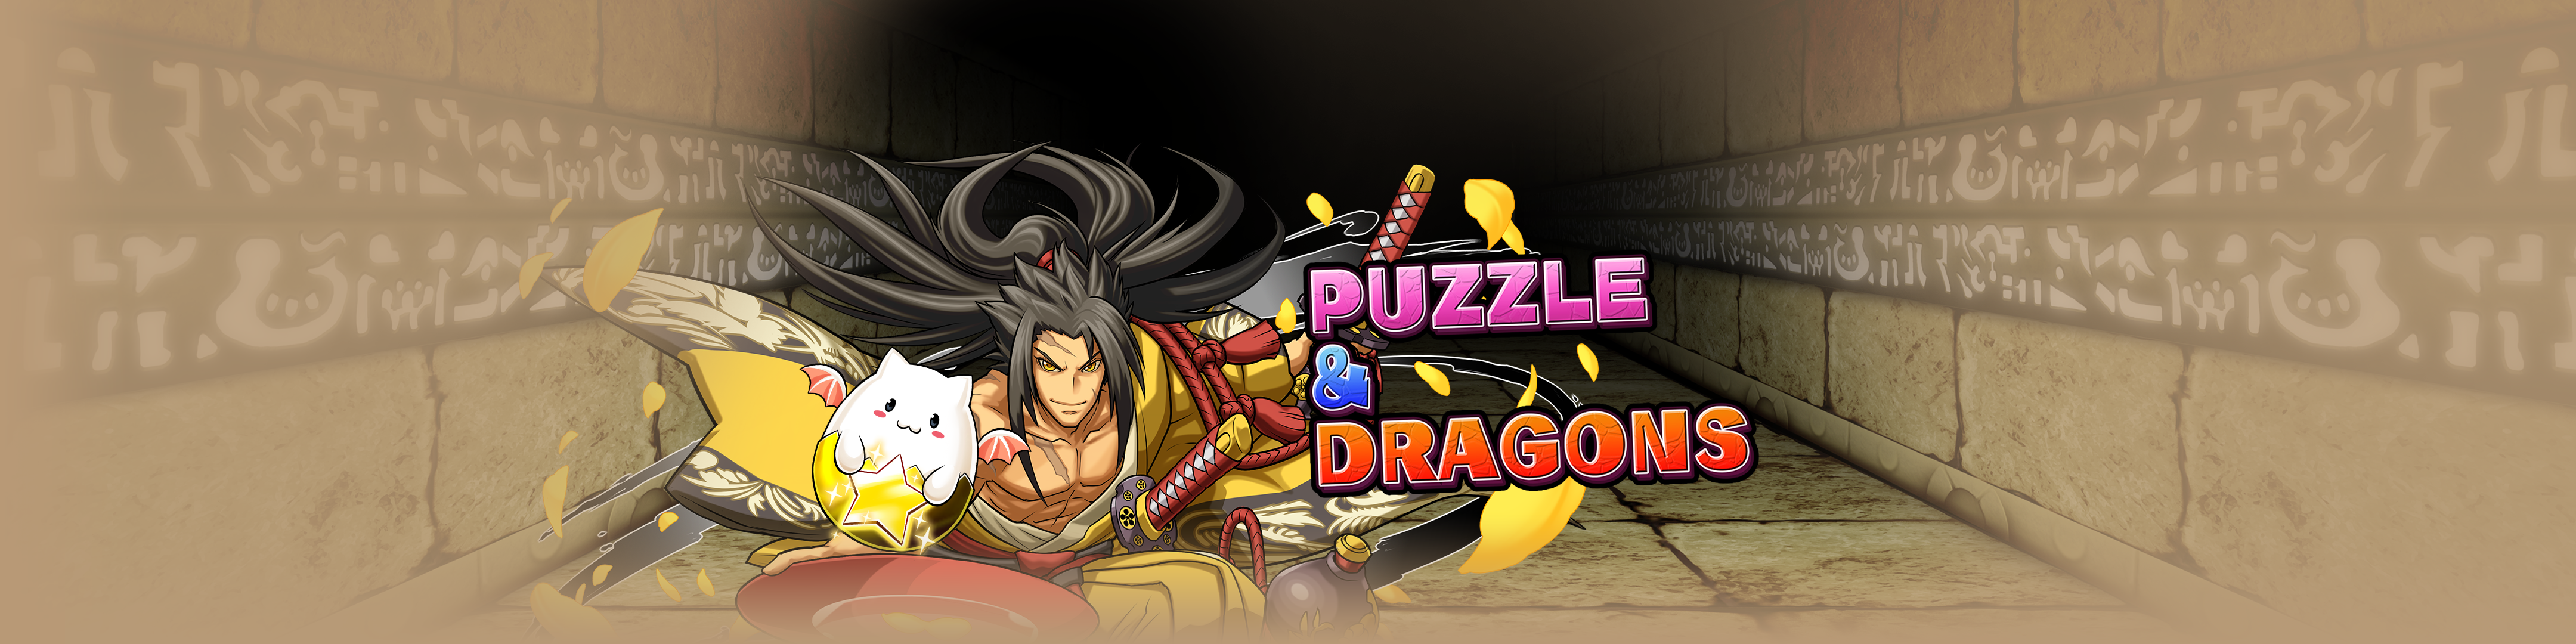 Puzzle & Dragons (English) - Revenue & Download estimates